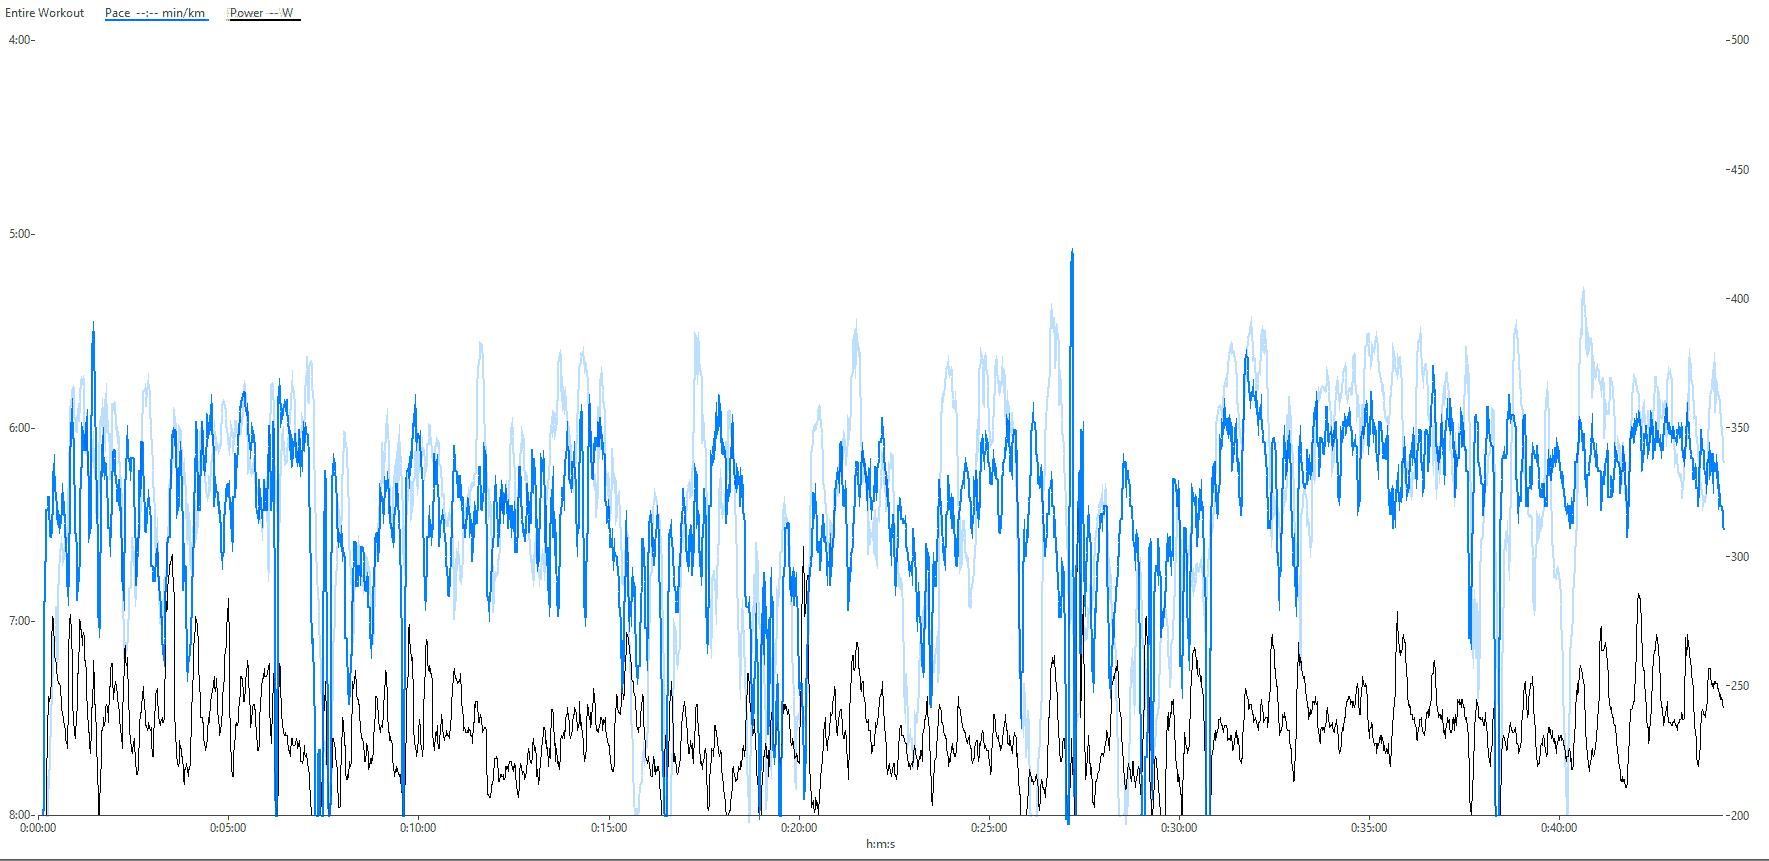 Garmin Forerunner 945 Stryd (dunkelblau) und GPS (hellblau)